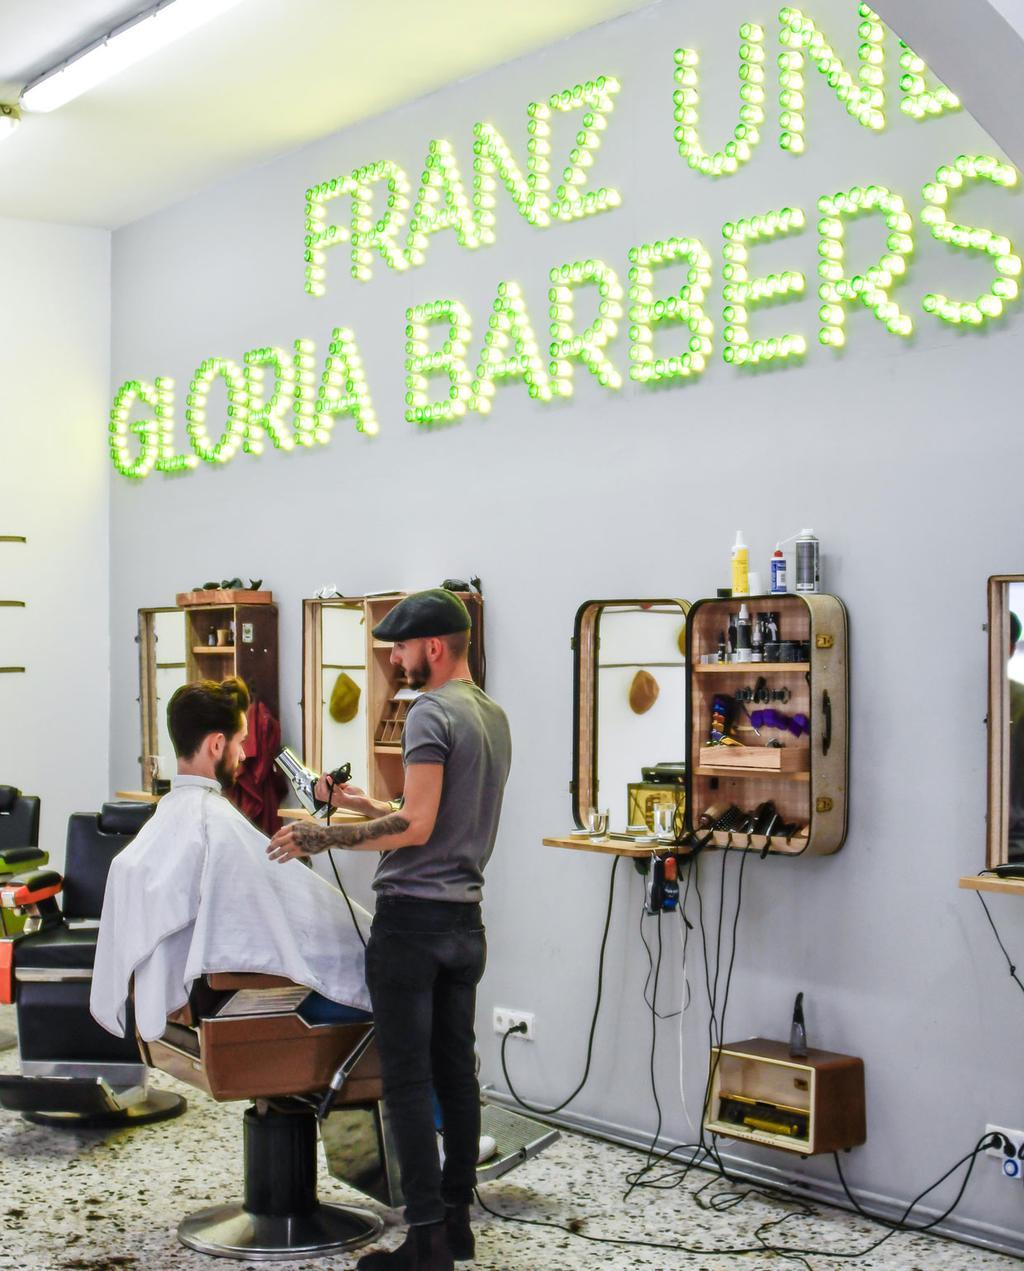 vtwonen 12-2019 | citytrip hotspot wenen voordeel citytrip Barbershop Franz und Gloria